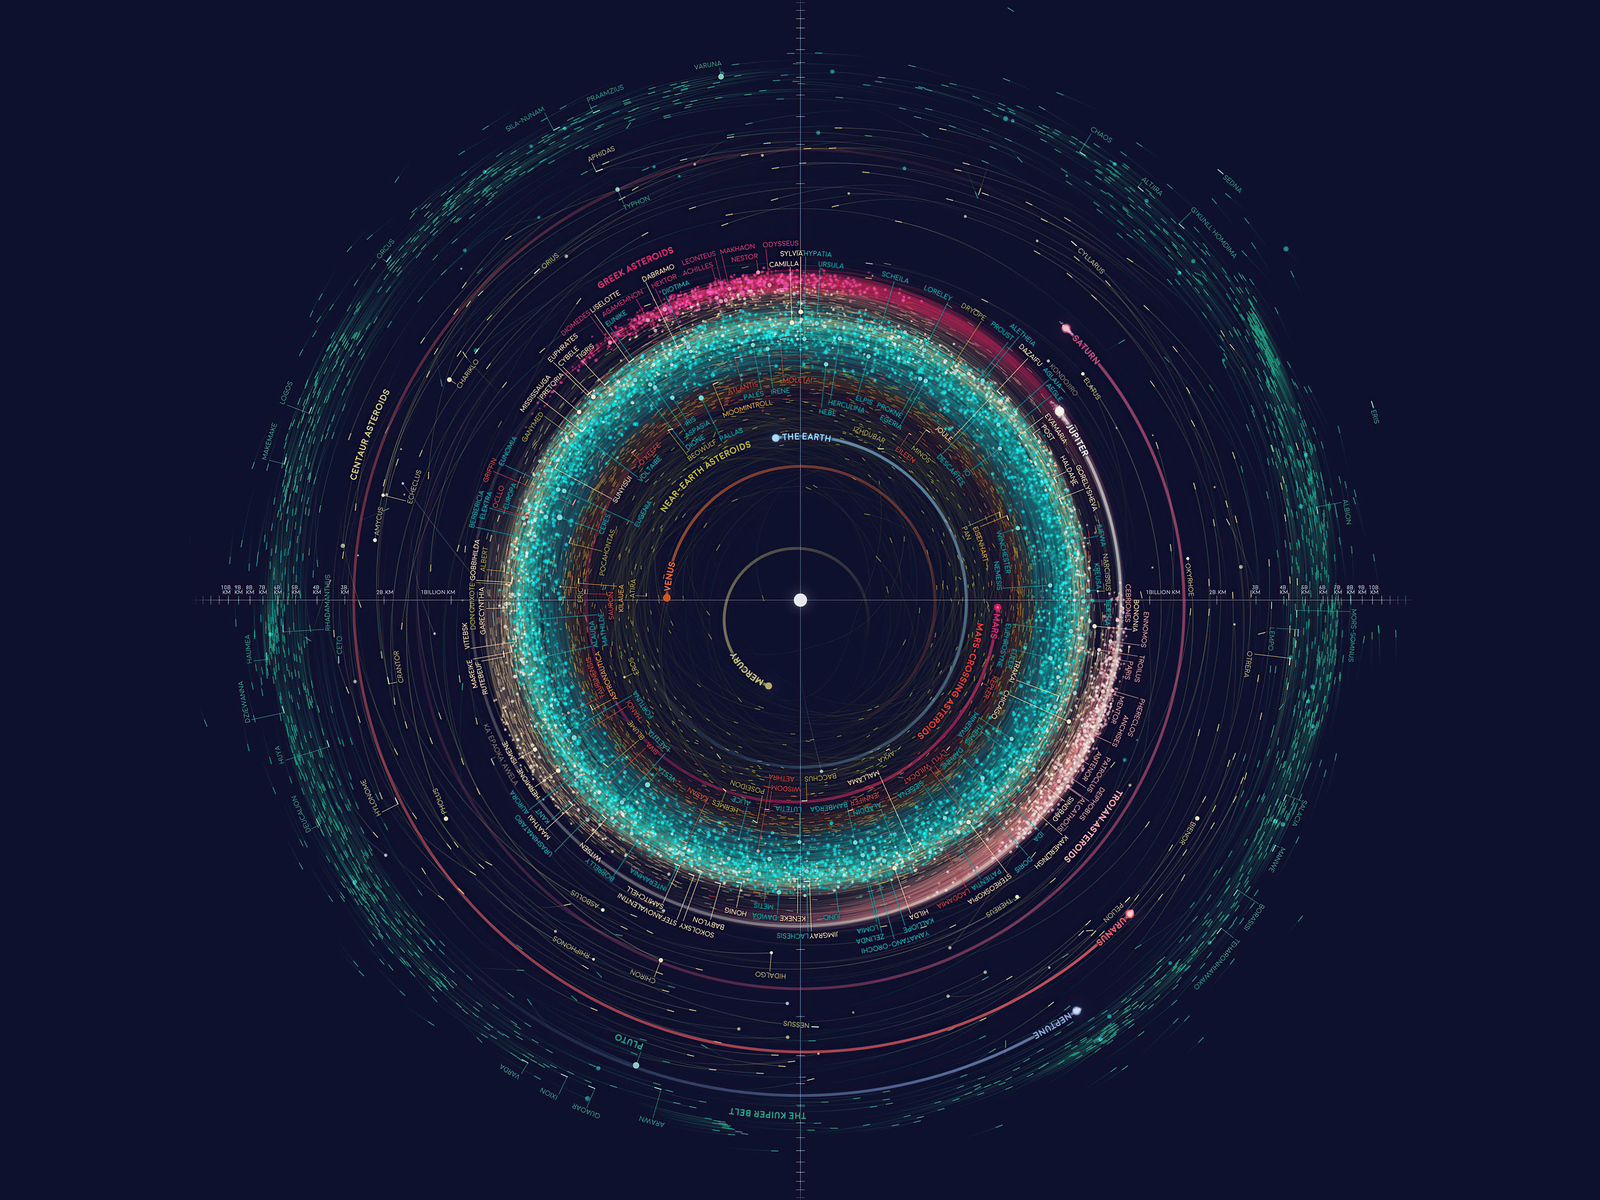 solar-system-map-5k-w6.jpg